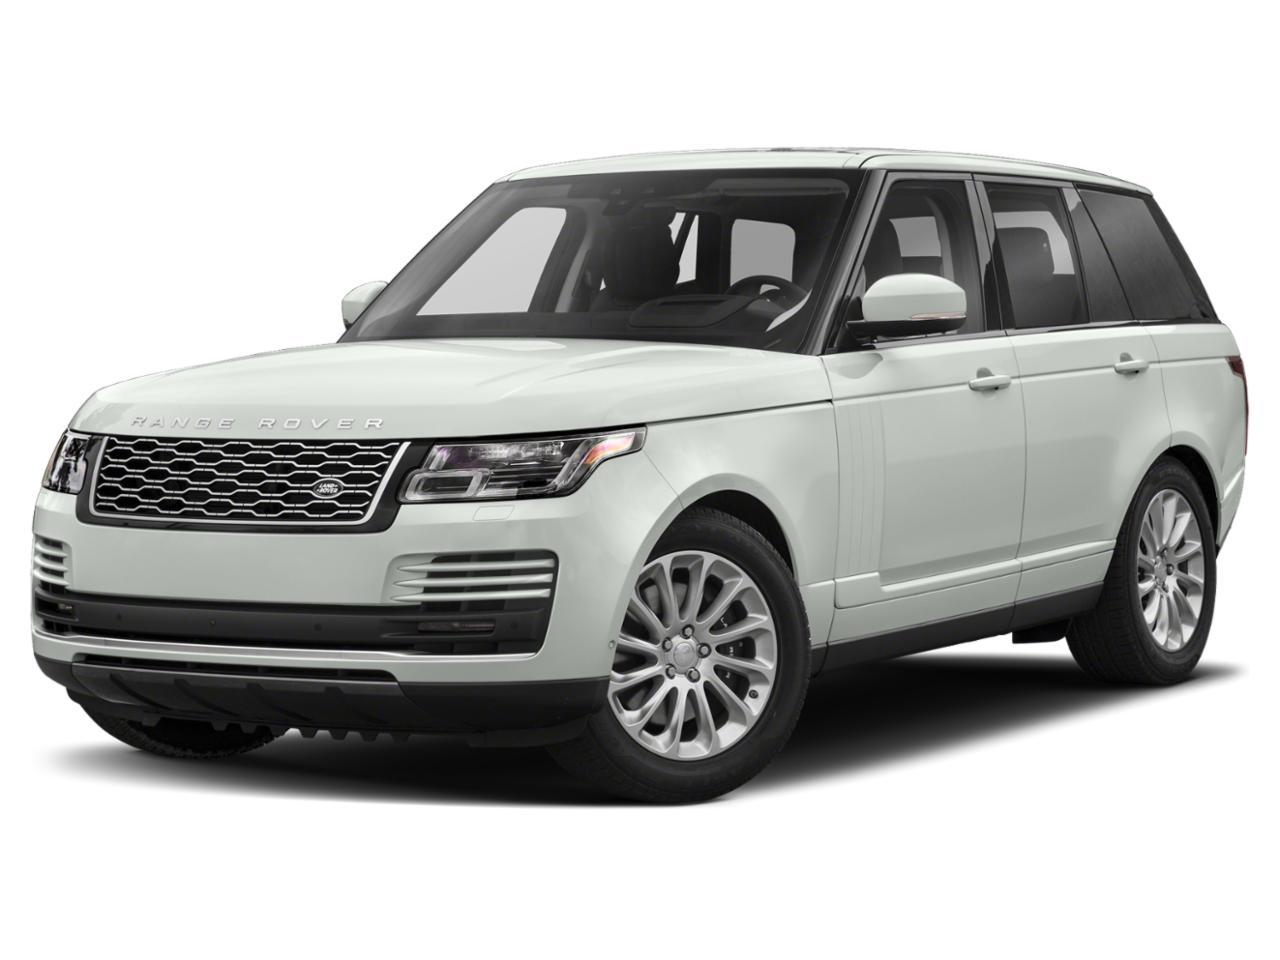 2021 Land Rover Range Rover Vehicle Photo in Austin, TX 78717